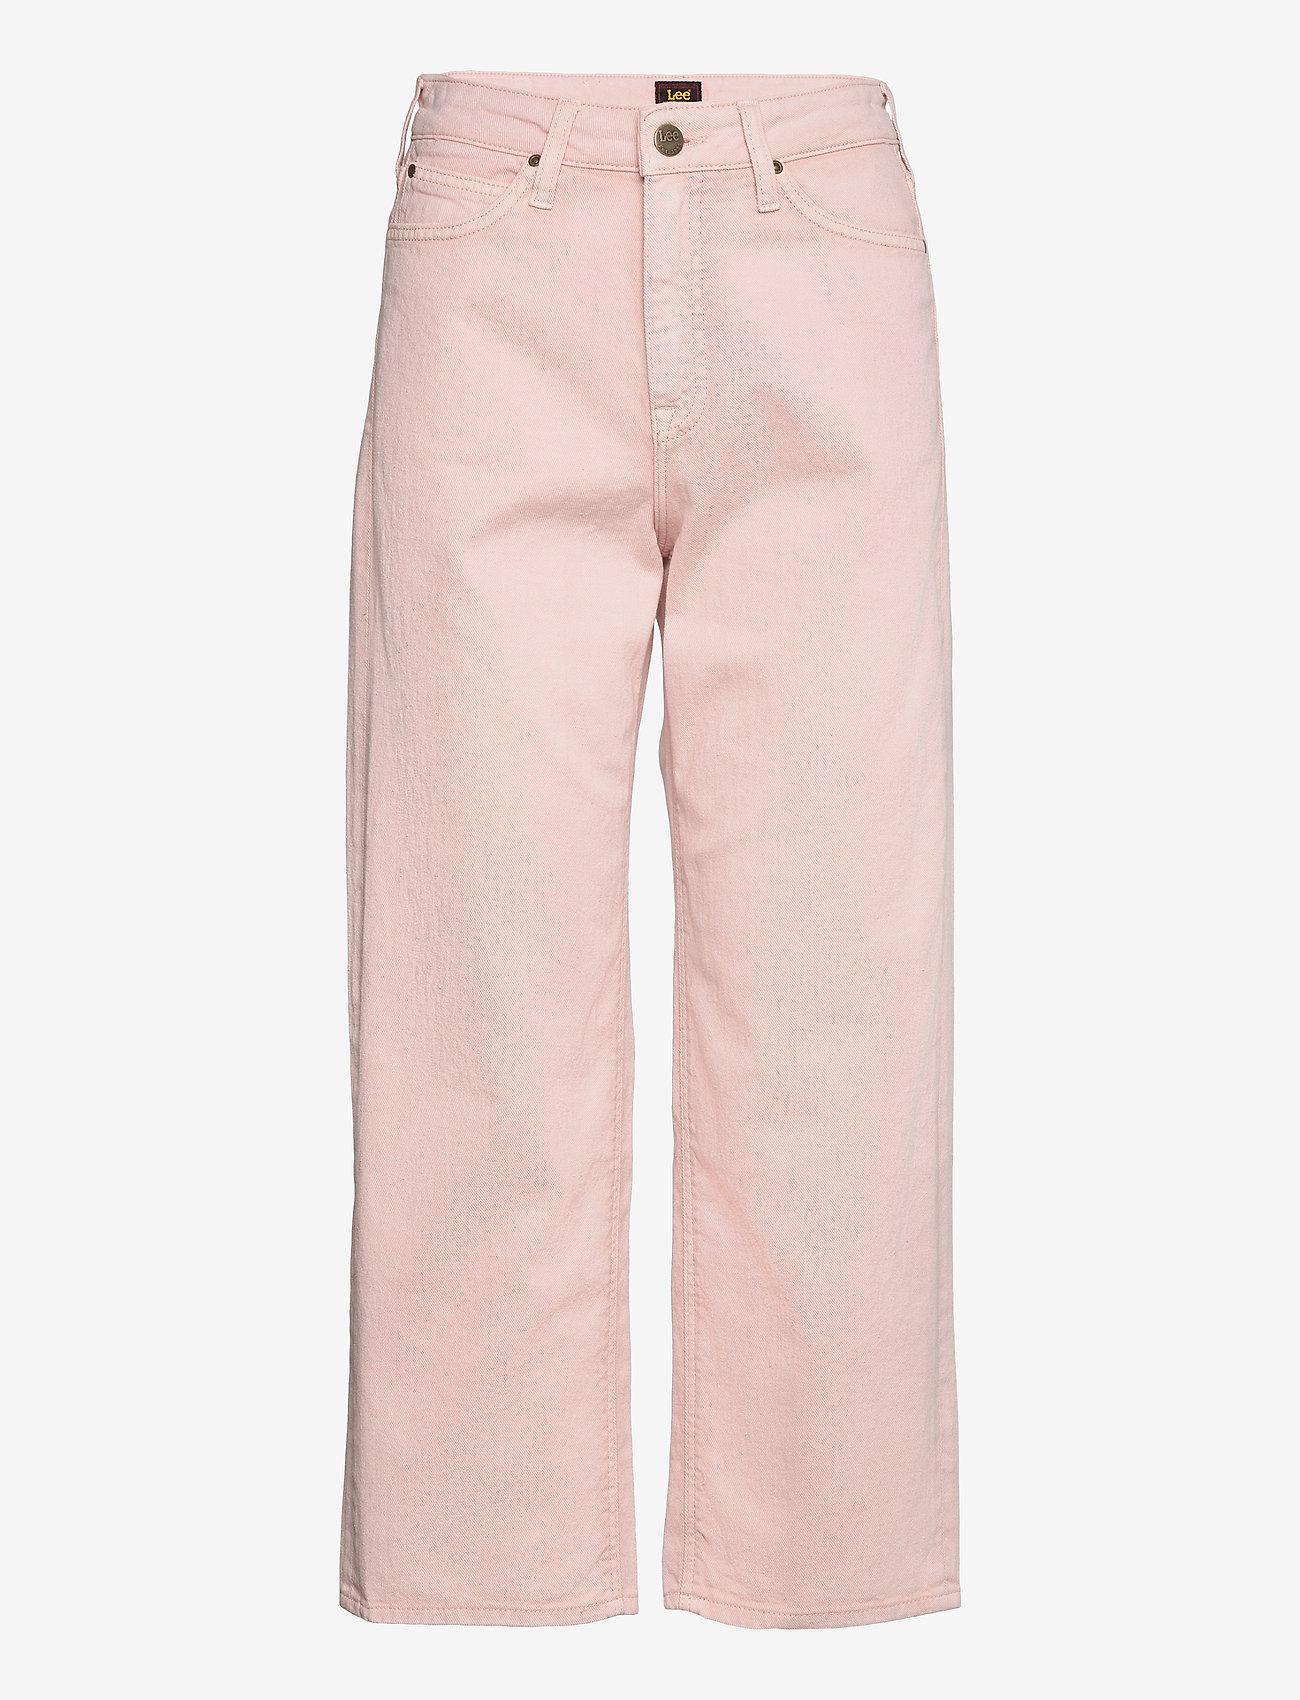 Lee Jeans - WIDE LEG - brede jeans - dark marlow - 0